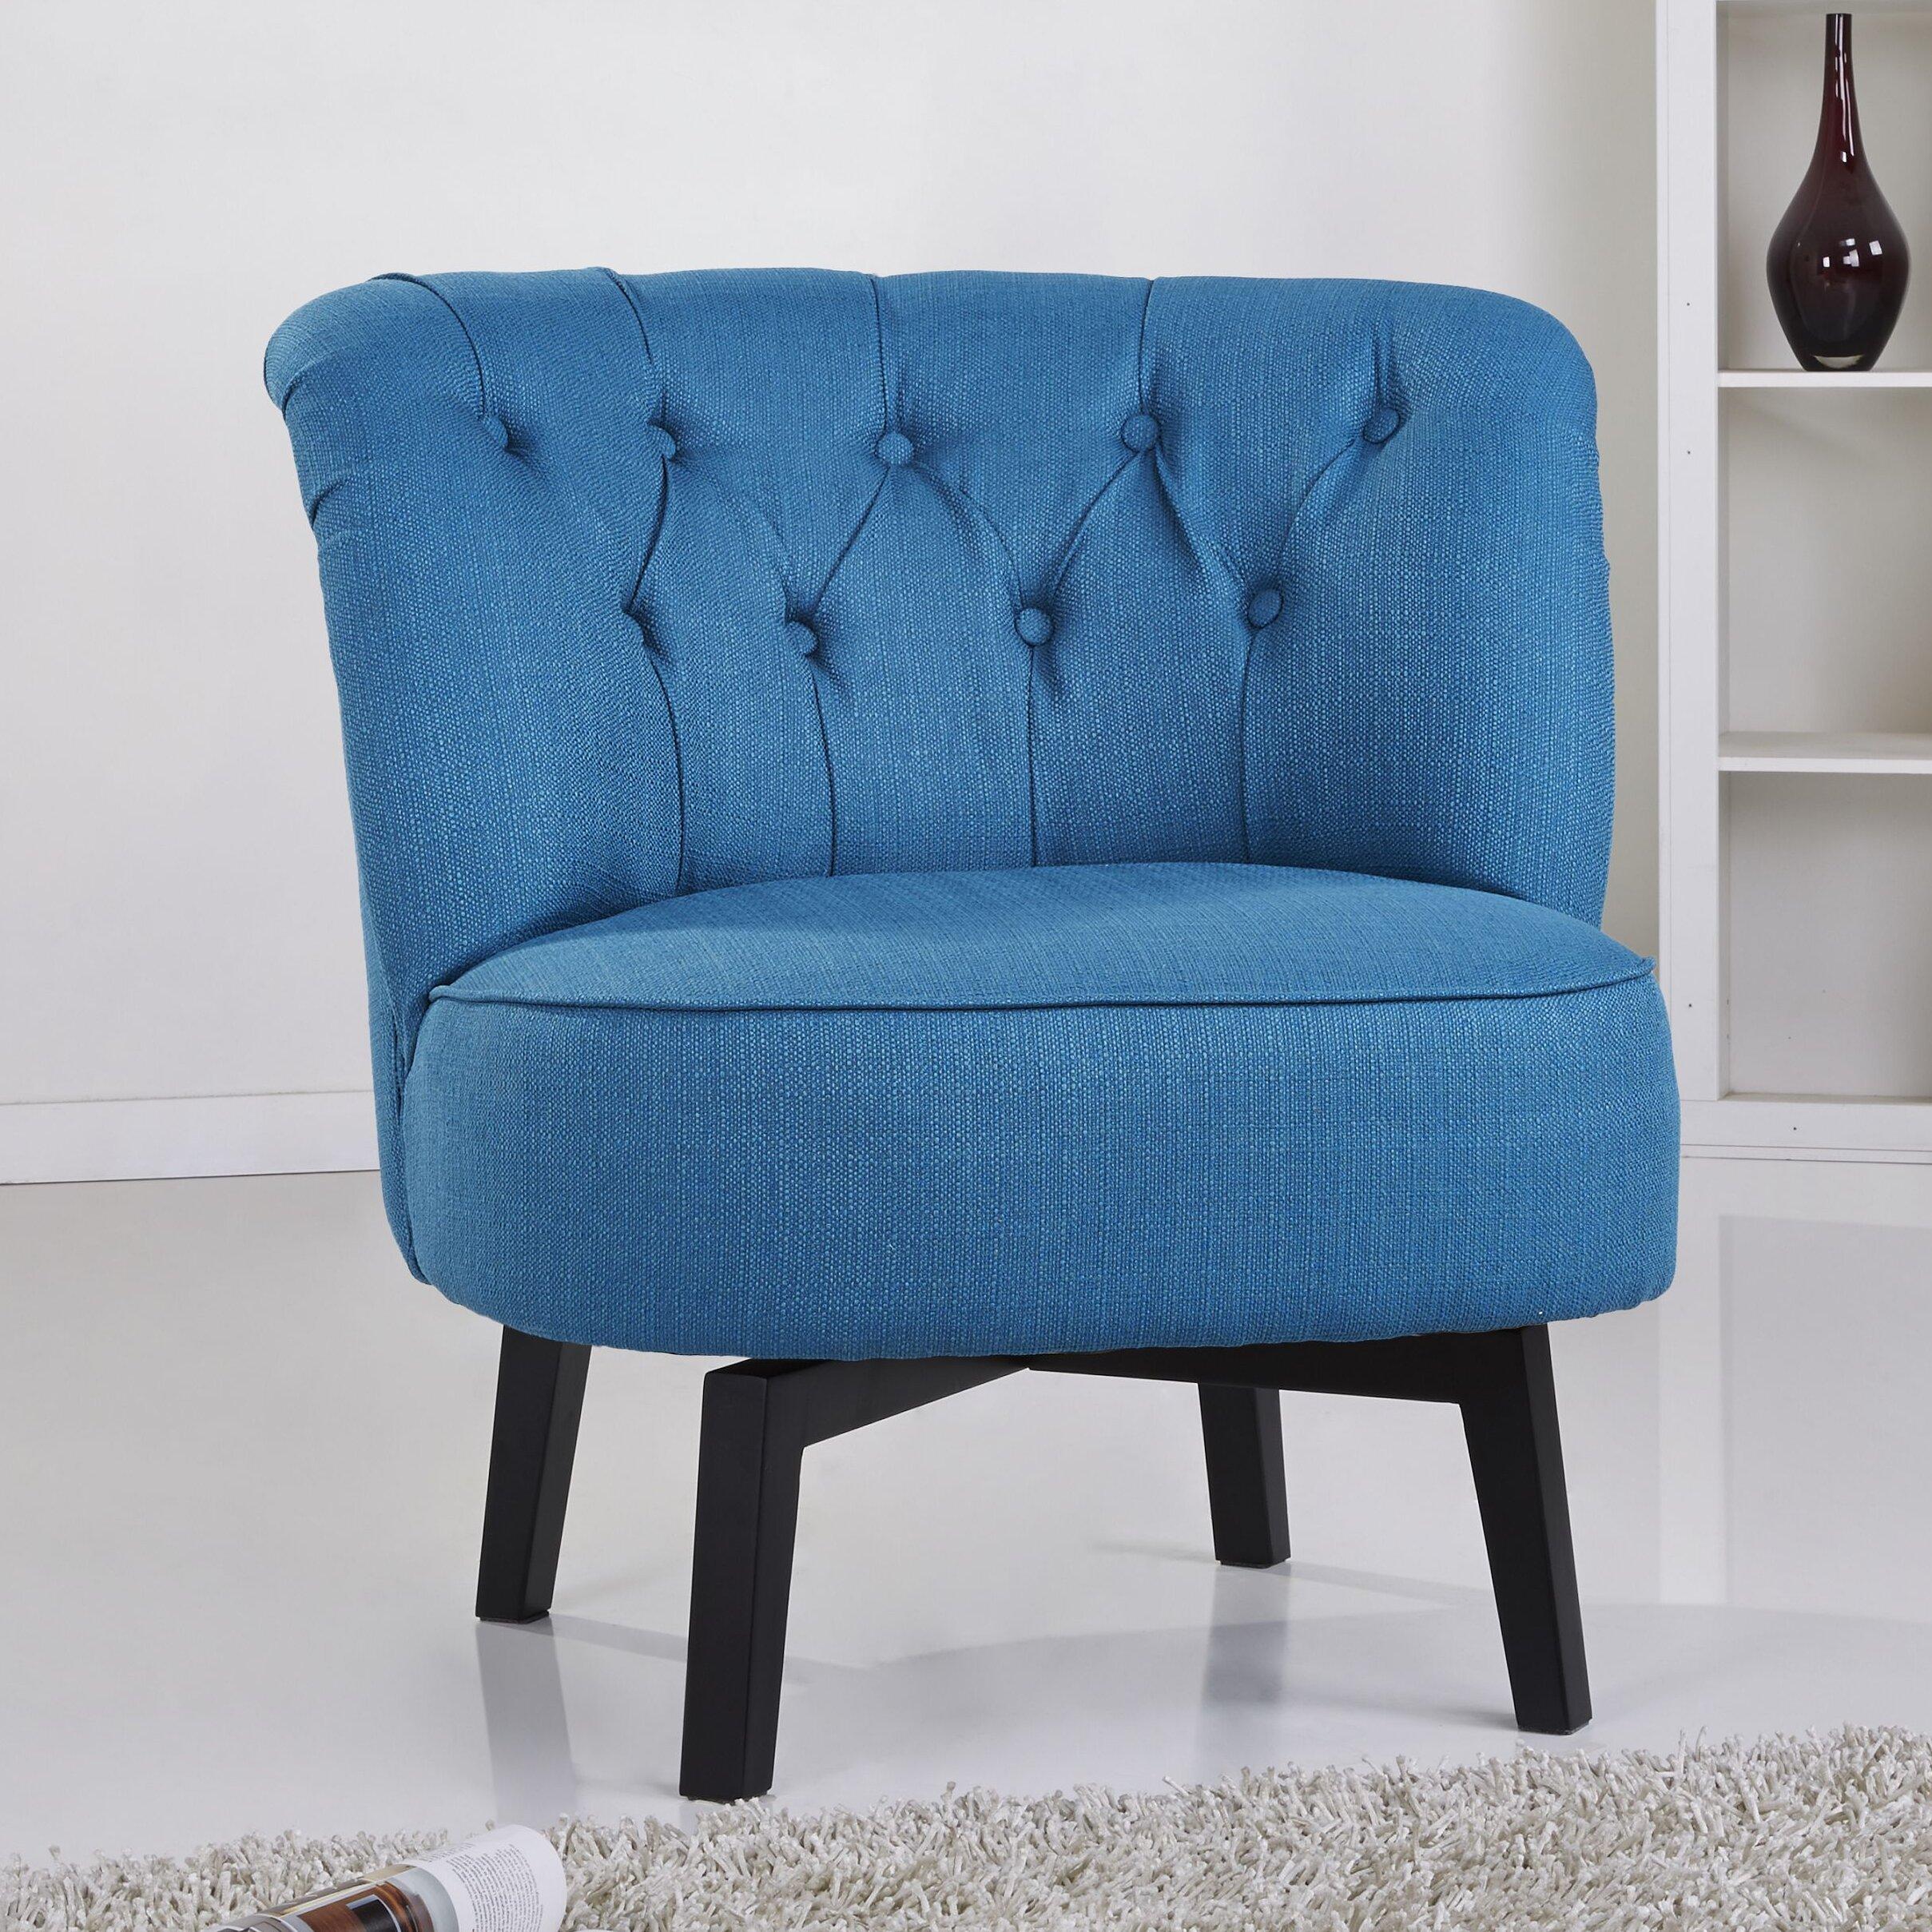 Leader Lifestyle Jade Tub Chair & Reviews   Wayfair.co.uk